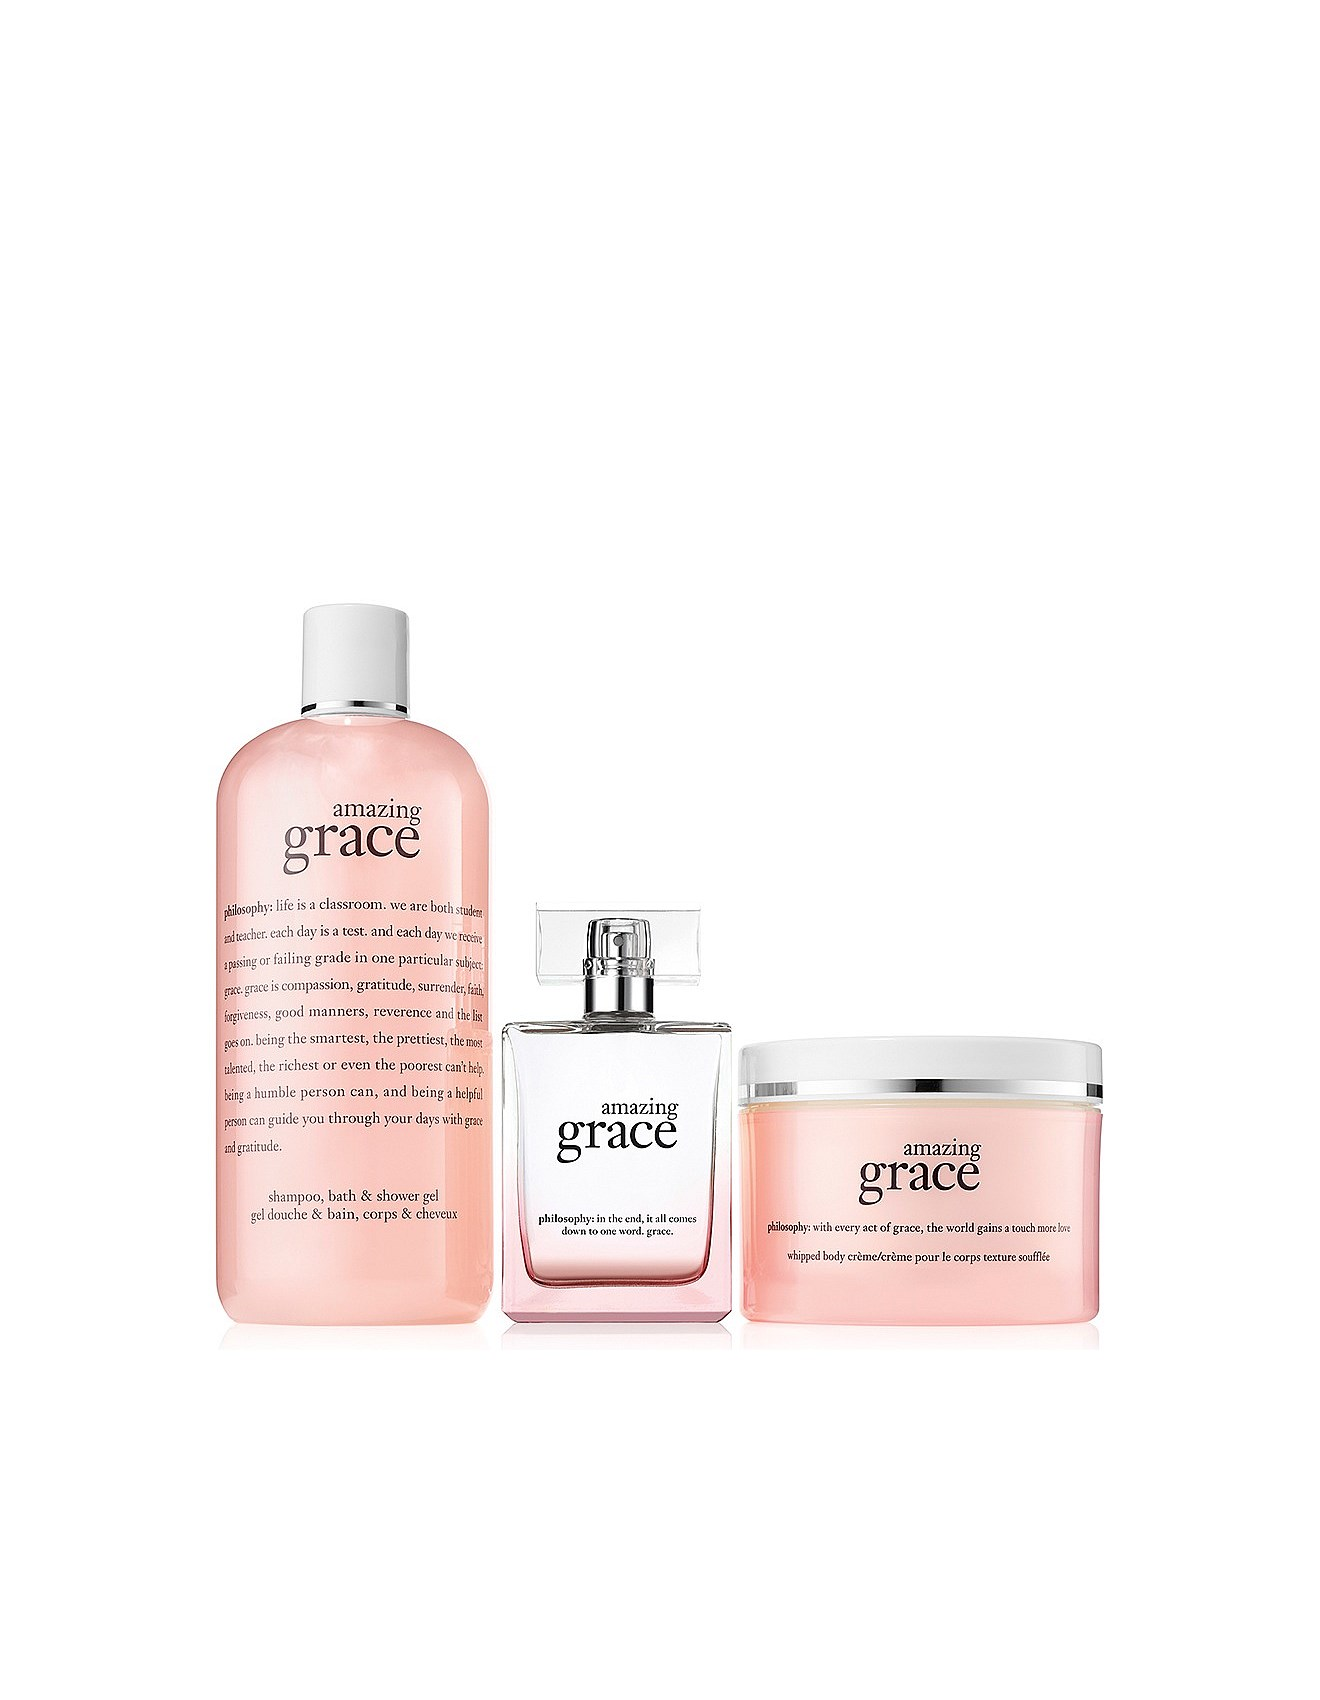 Makeup Perfume Beauty Skincare Shop Online David Jones Amazing Grace Edp Set